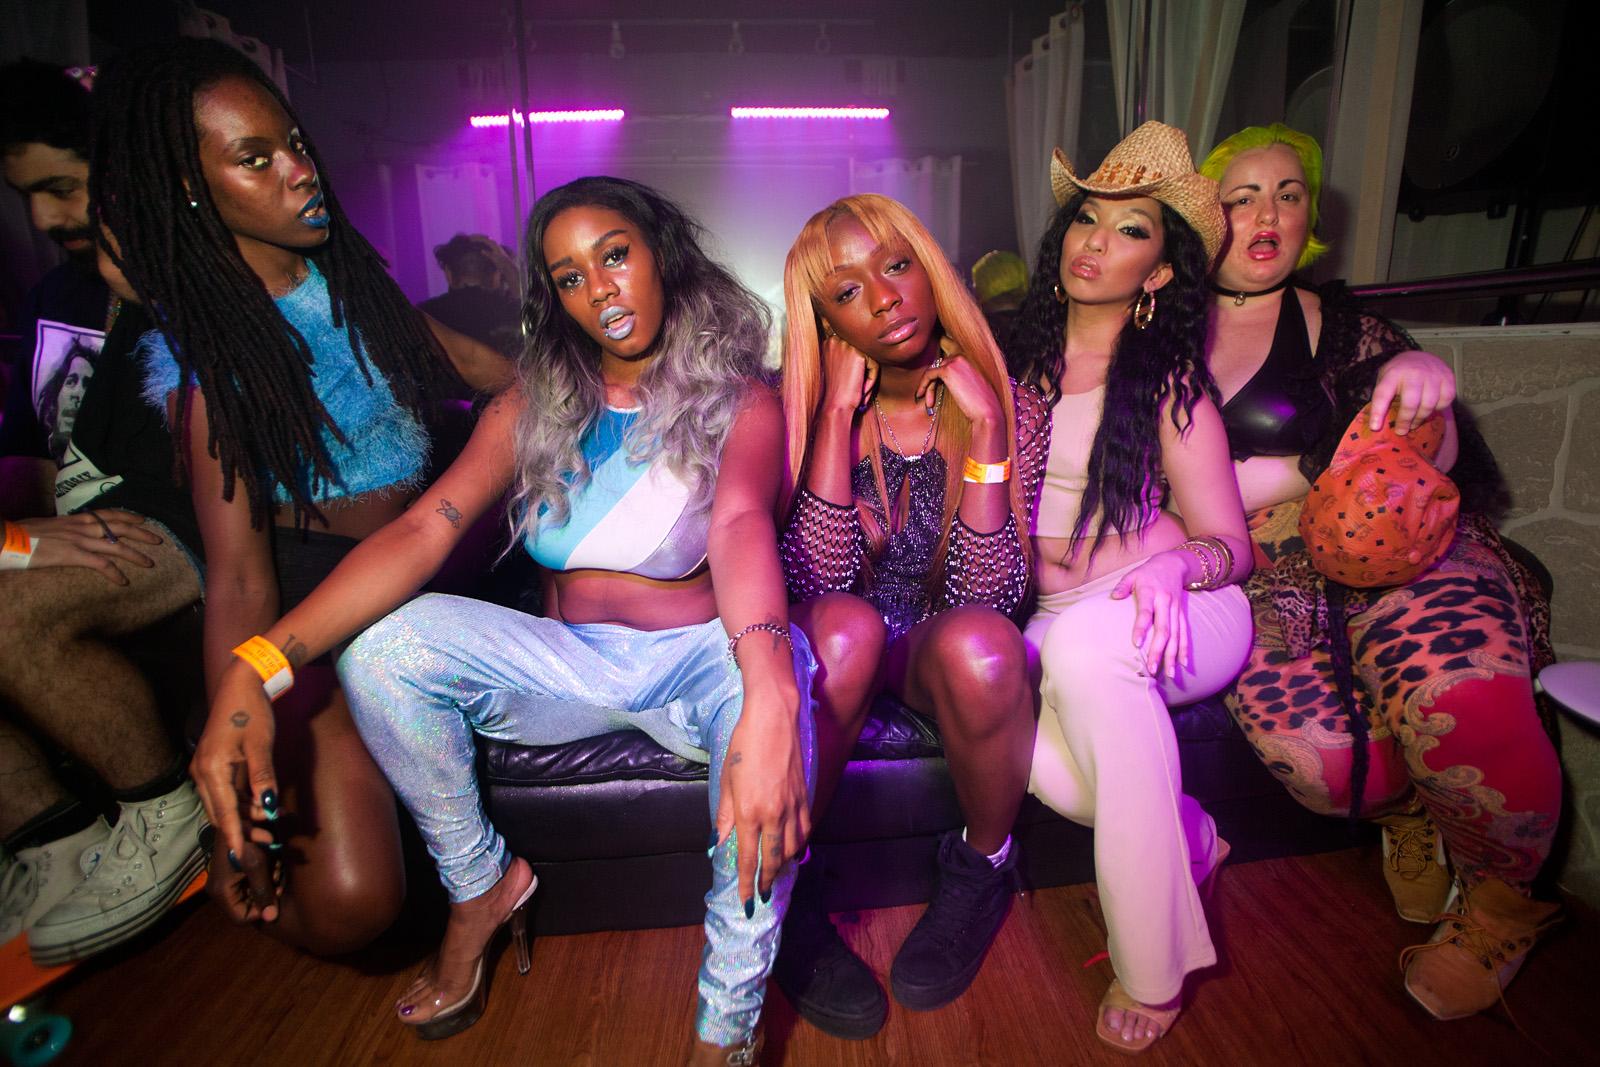 Dancer, Dai Burger, Junglepussy, Kay Rizz, Contessa Stuto